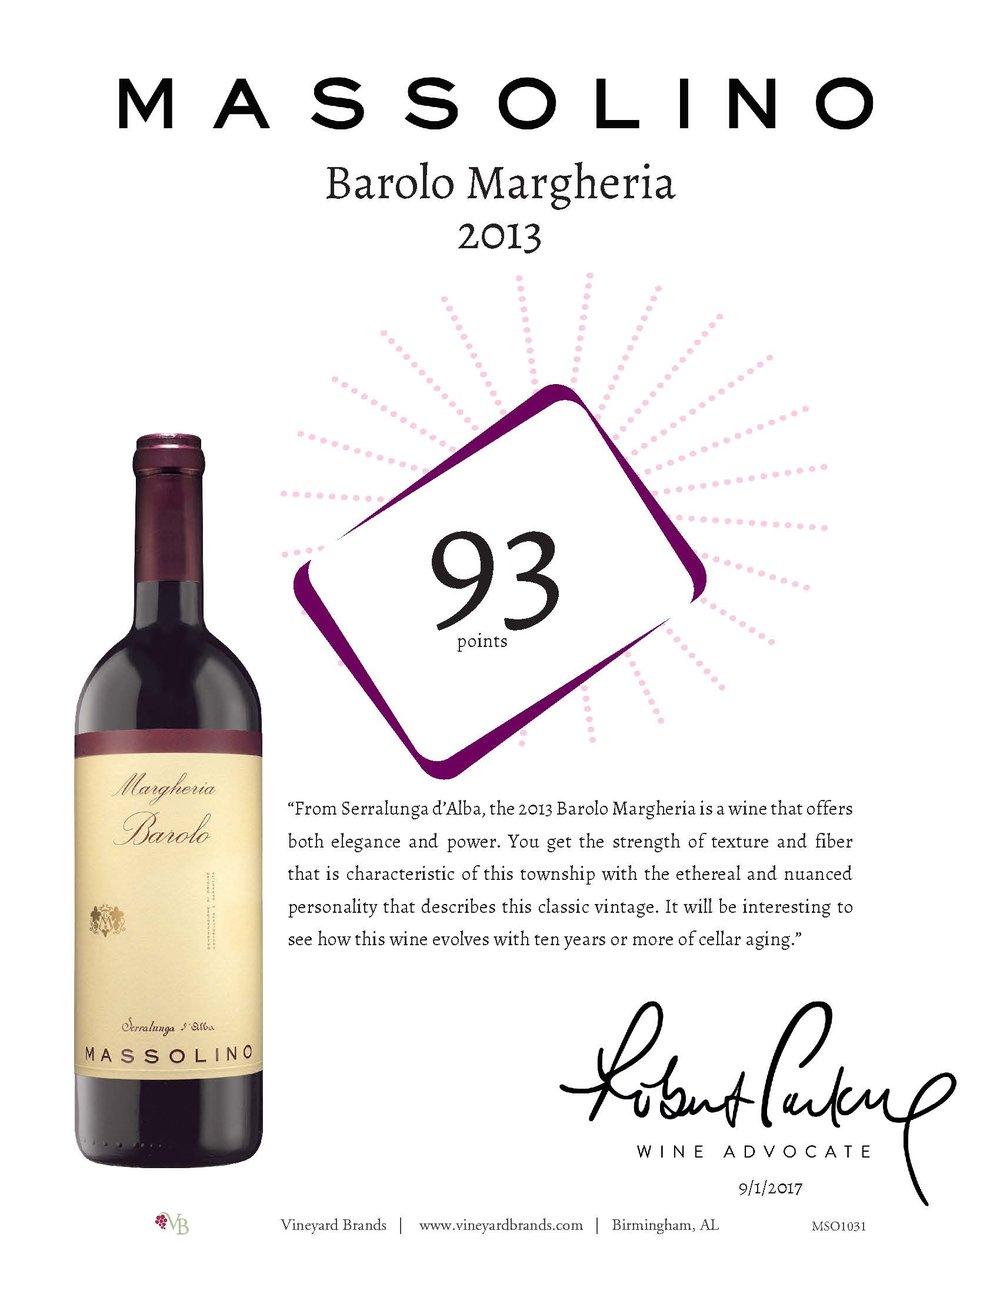 Massolino Barolo Margheria 2013.jpg